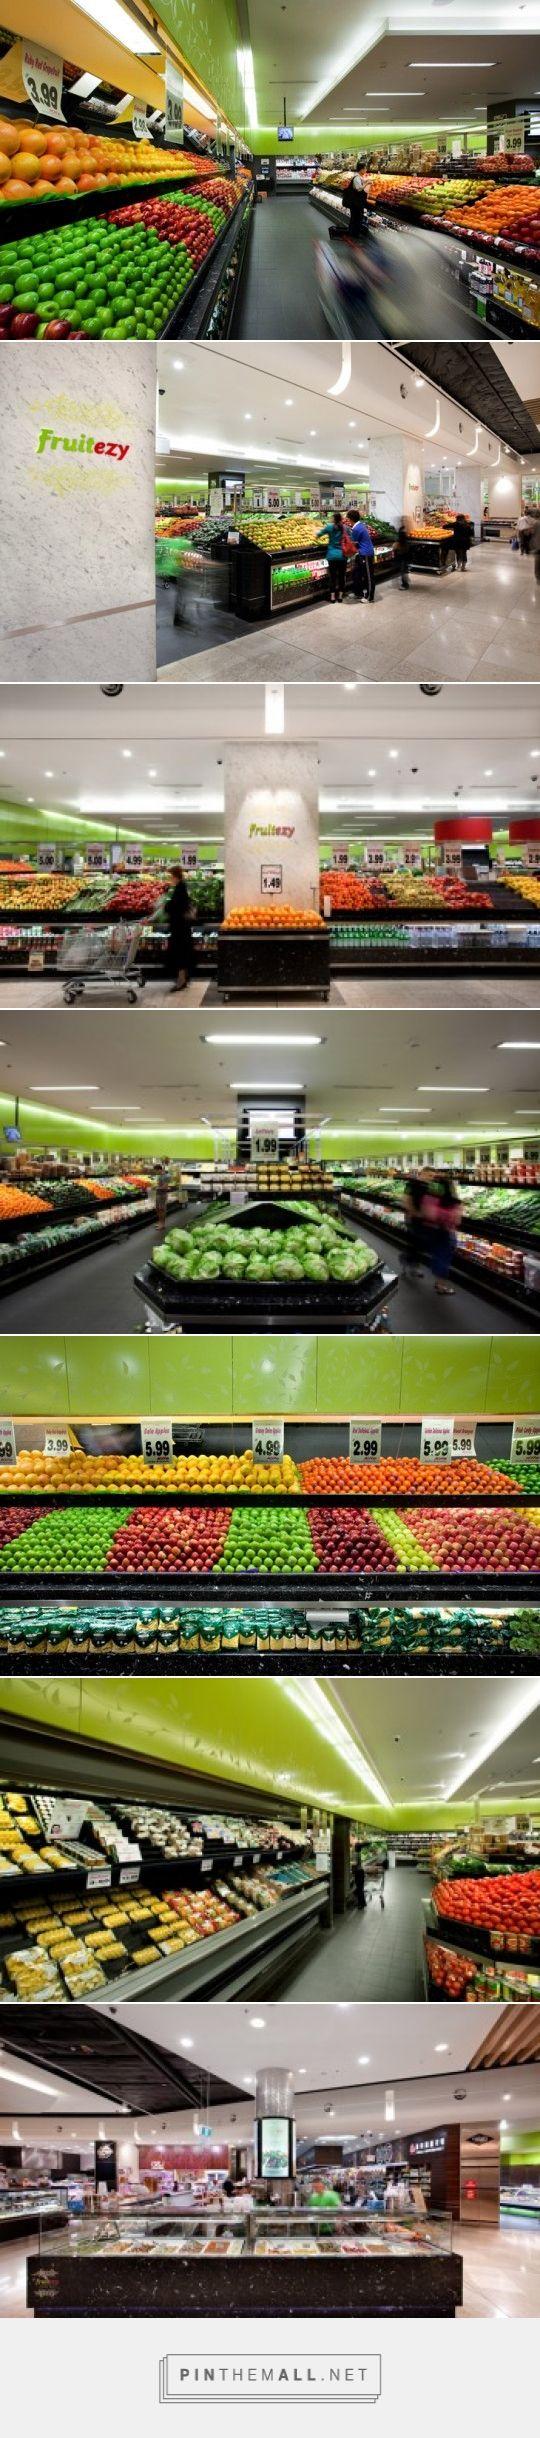 Fruitezy | Mima - created via http://pinthemall.net